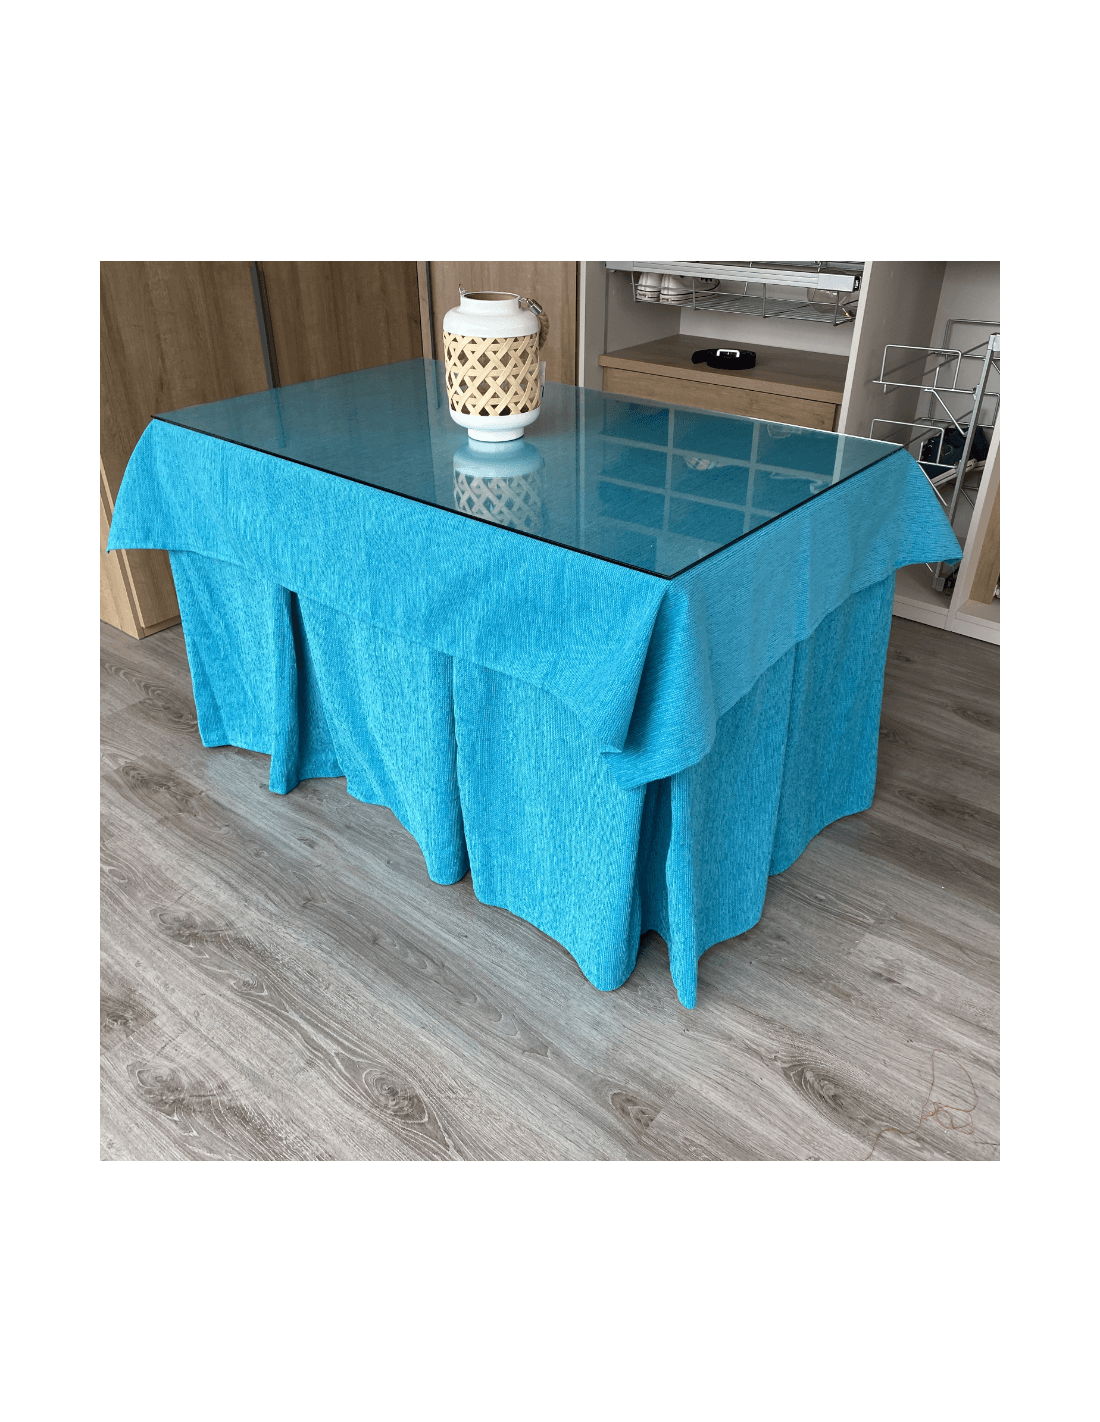 sofa 2 plazas reclinable y extraible odo oferta tela antimanchas